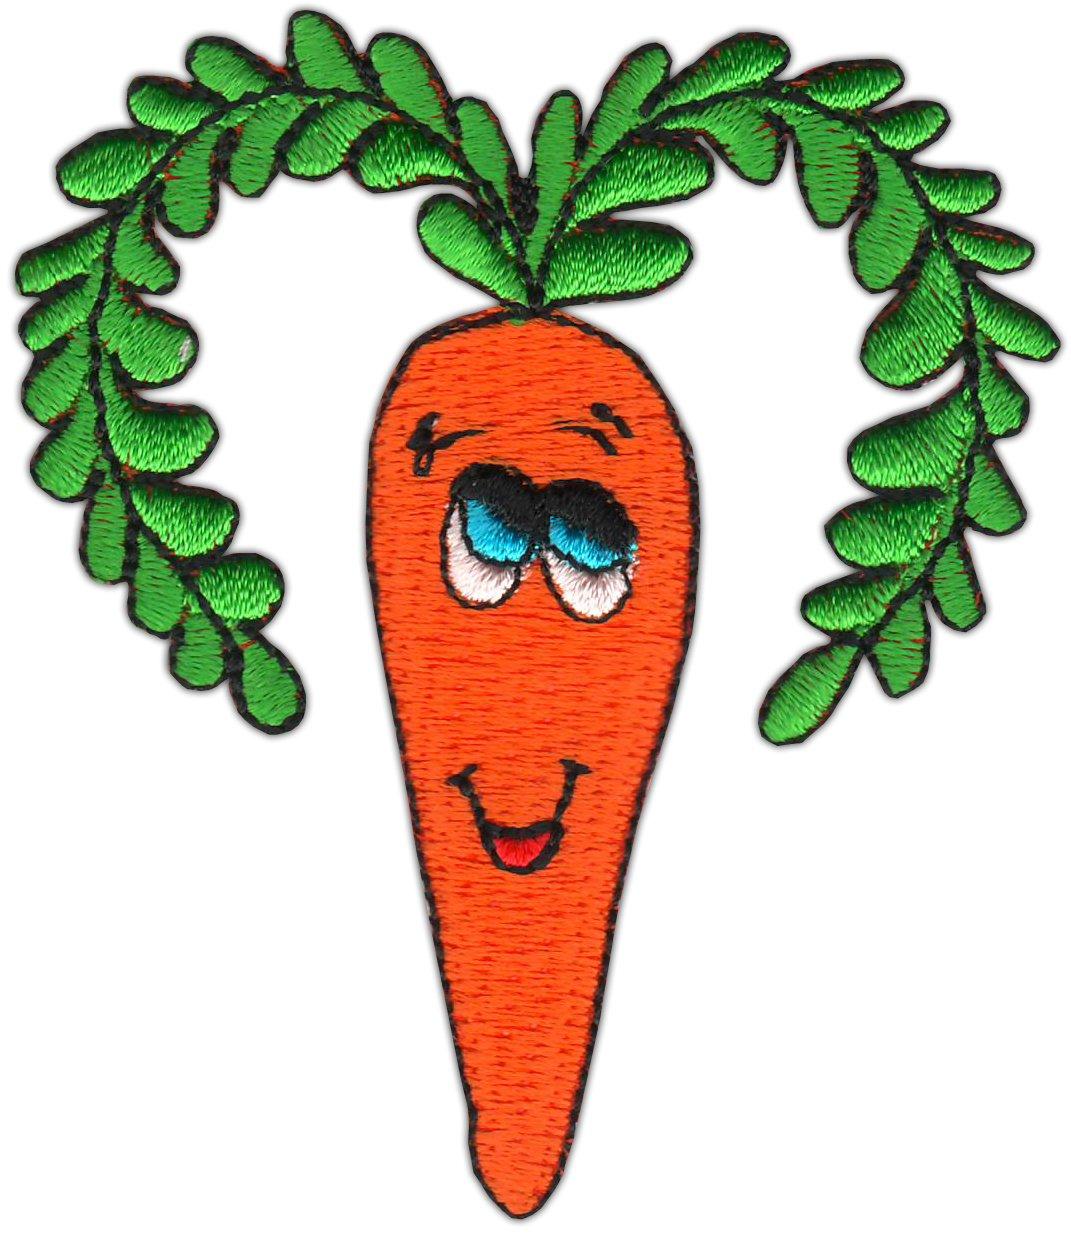 Patches Aufbügeln orange Karotte Gemüse 8 x 4,9 cm Aufnäher // Bügelbild